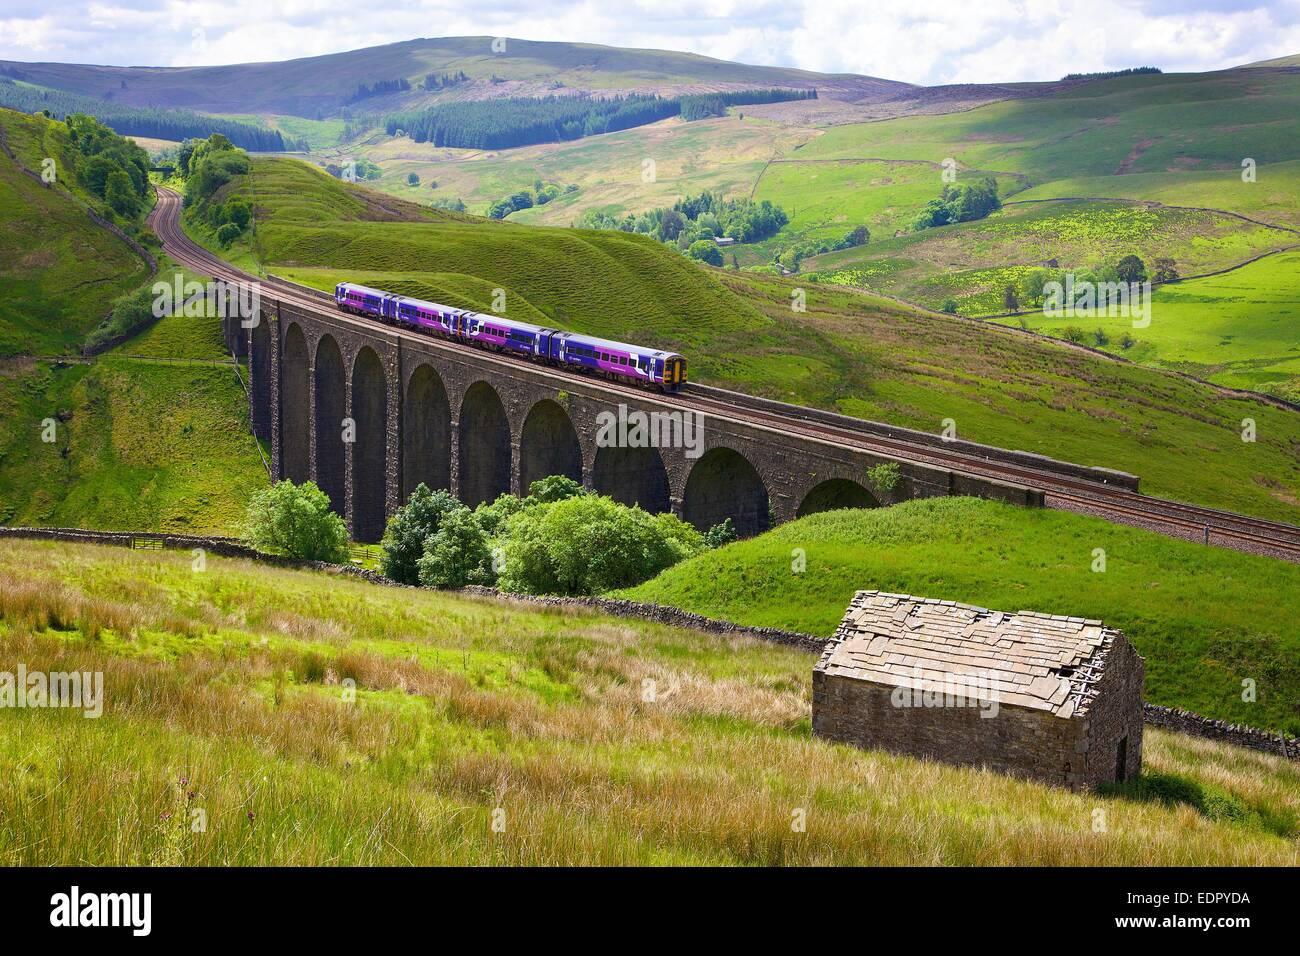 Northern Rail Sprinter. Arten Gill Viaduct, Dent, Cumbria, Yorkshire Dales National Park, England, UK. - Stock Image